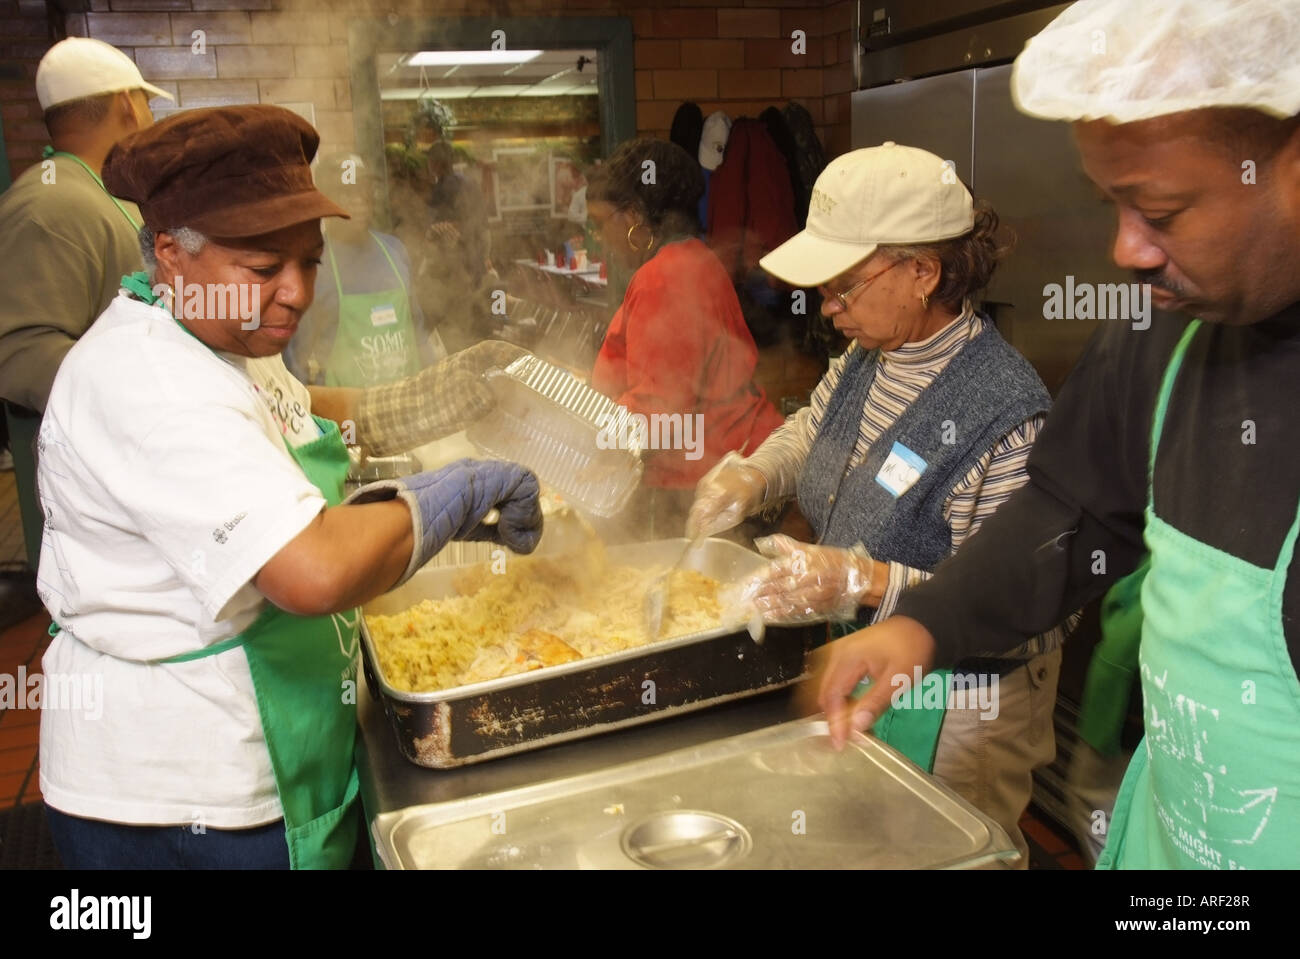 usa-washington-dc-community-volunteers-a